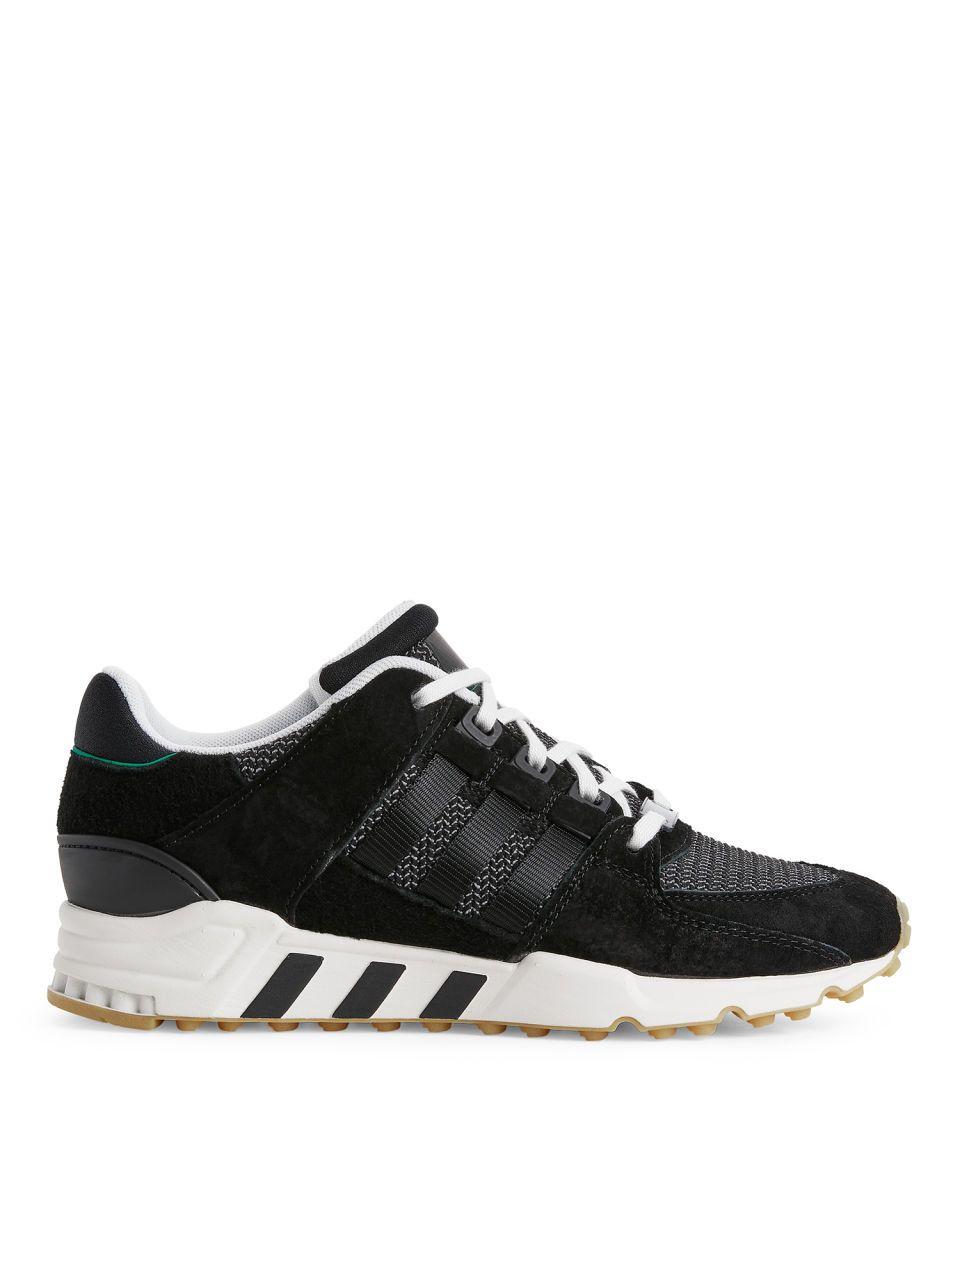 adidas EQT Support RF   Shoes, Black shoes, Adidas